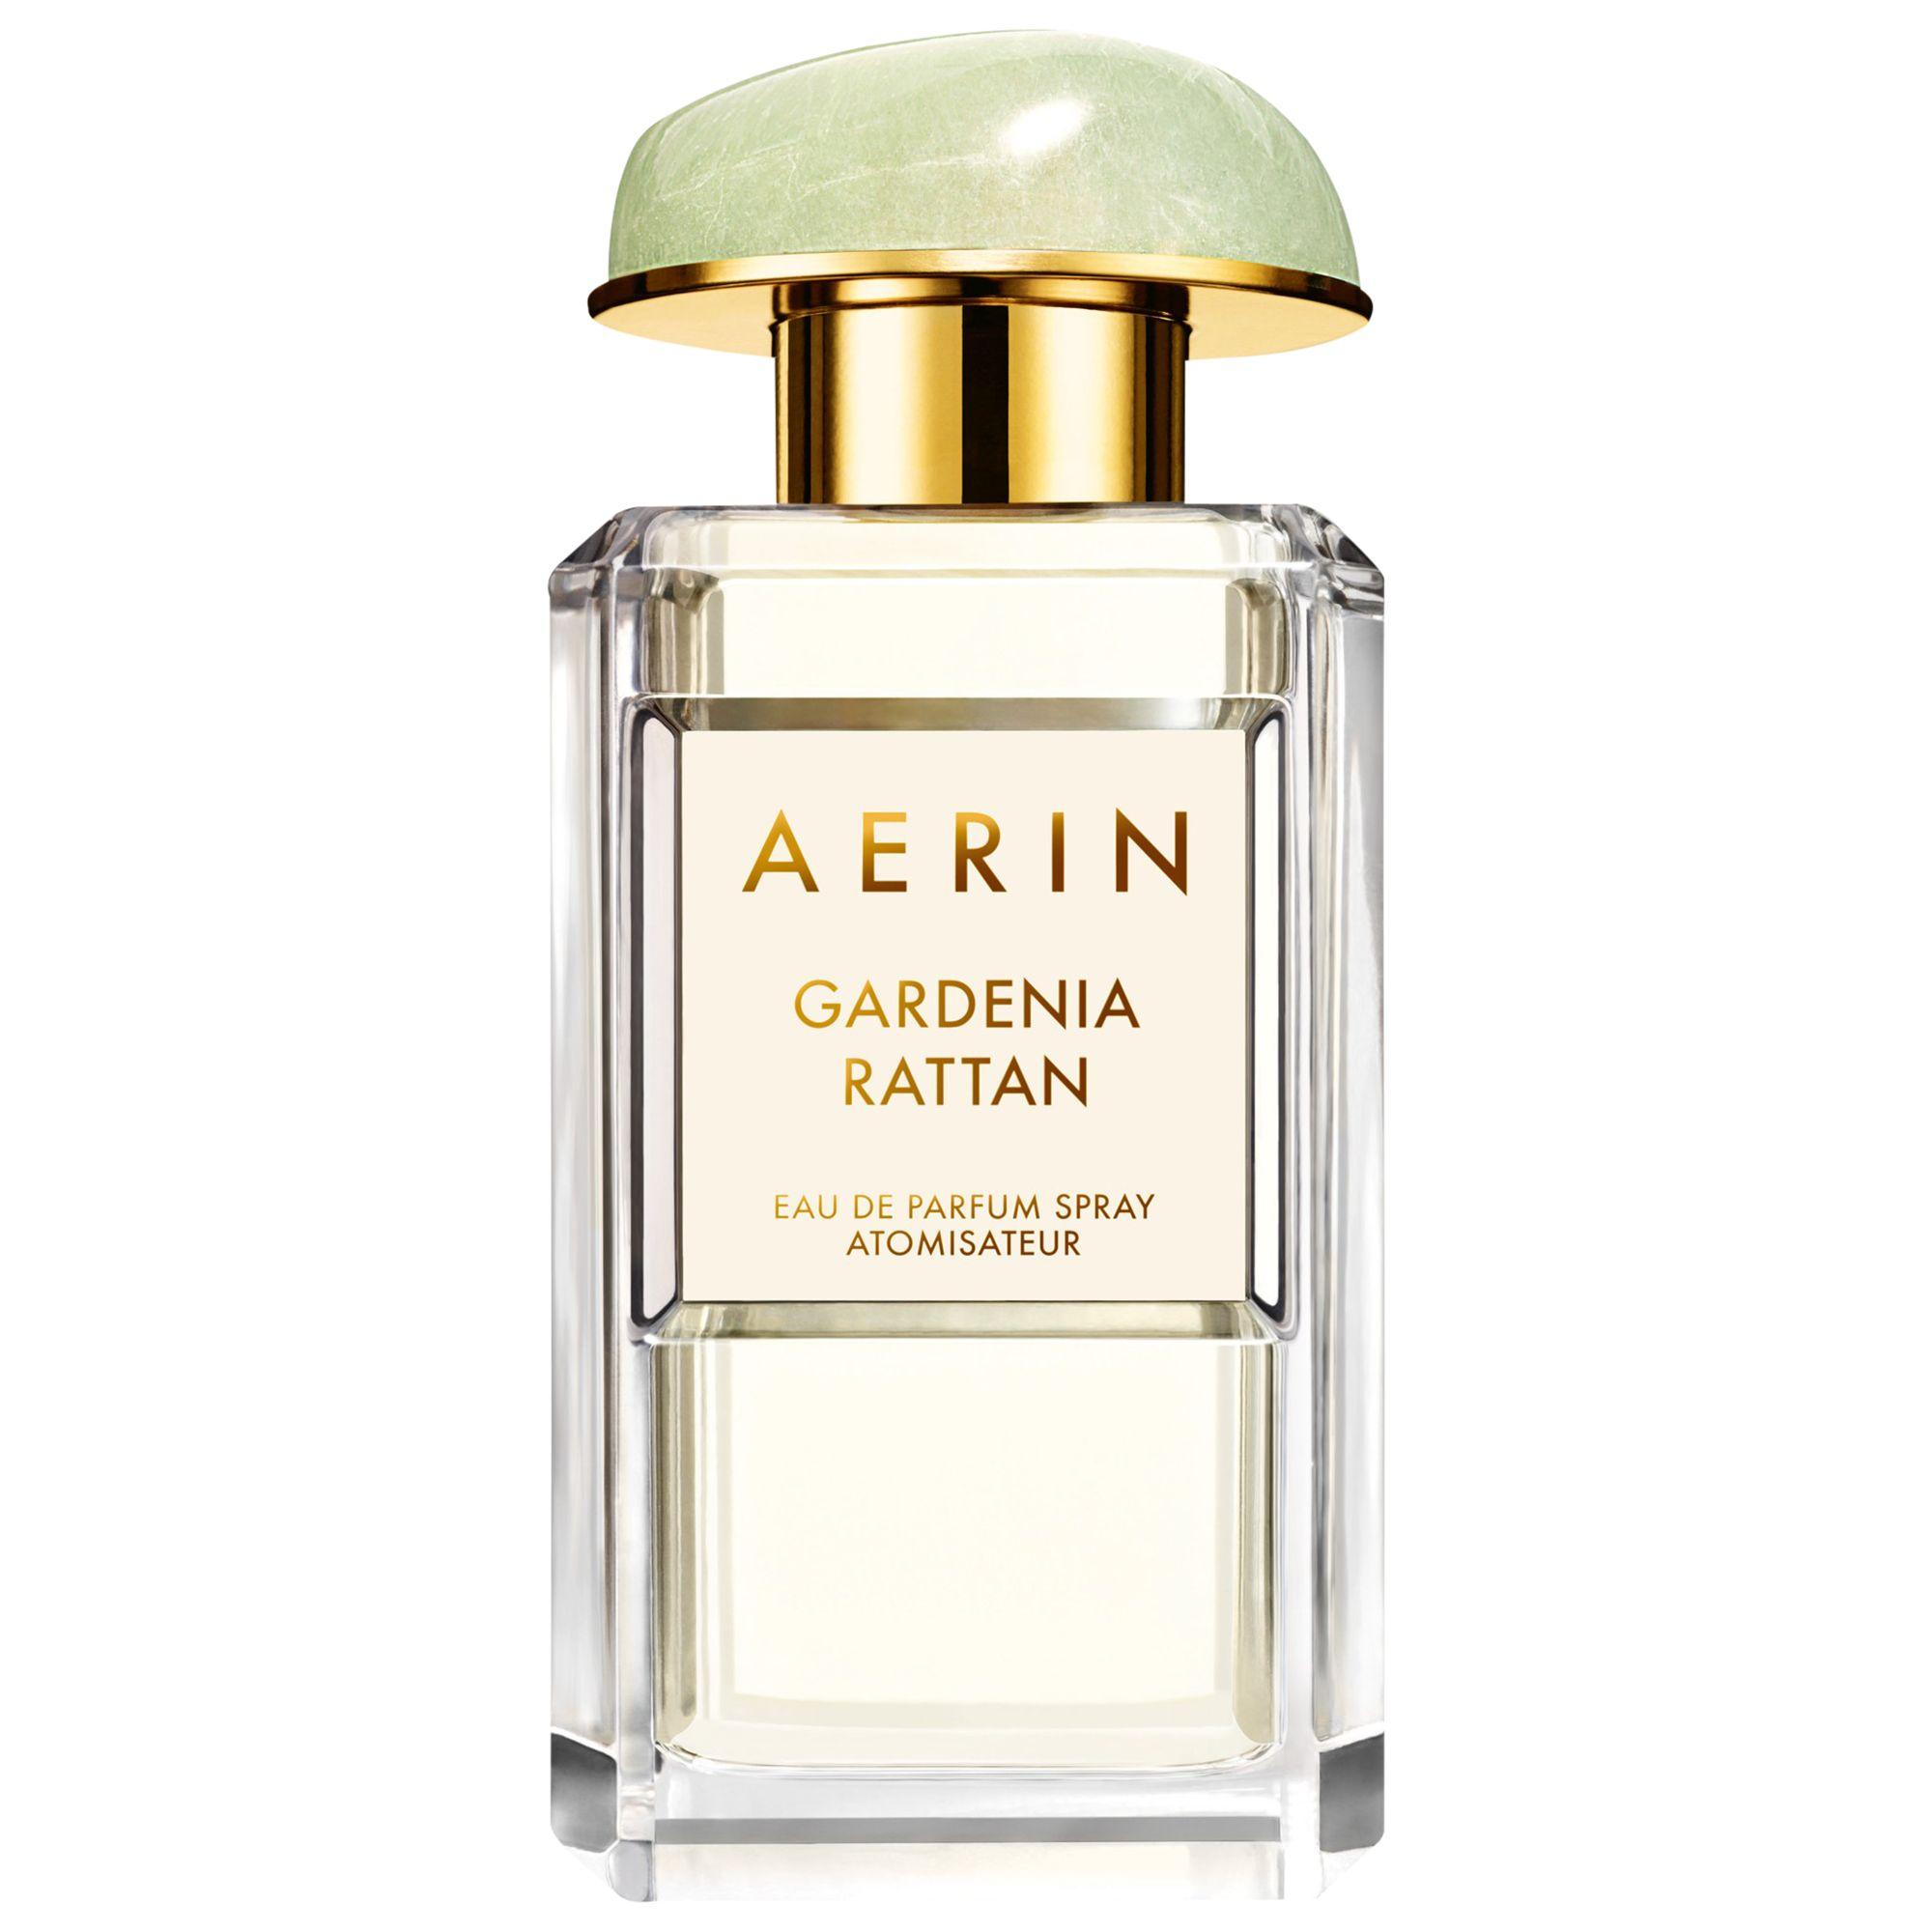 AERIN AERIN Gardenia Rattan Eau de Parfum, 100ml